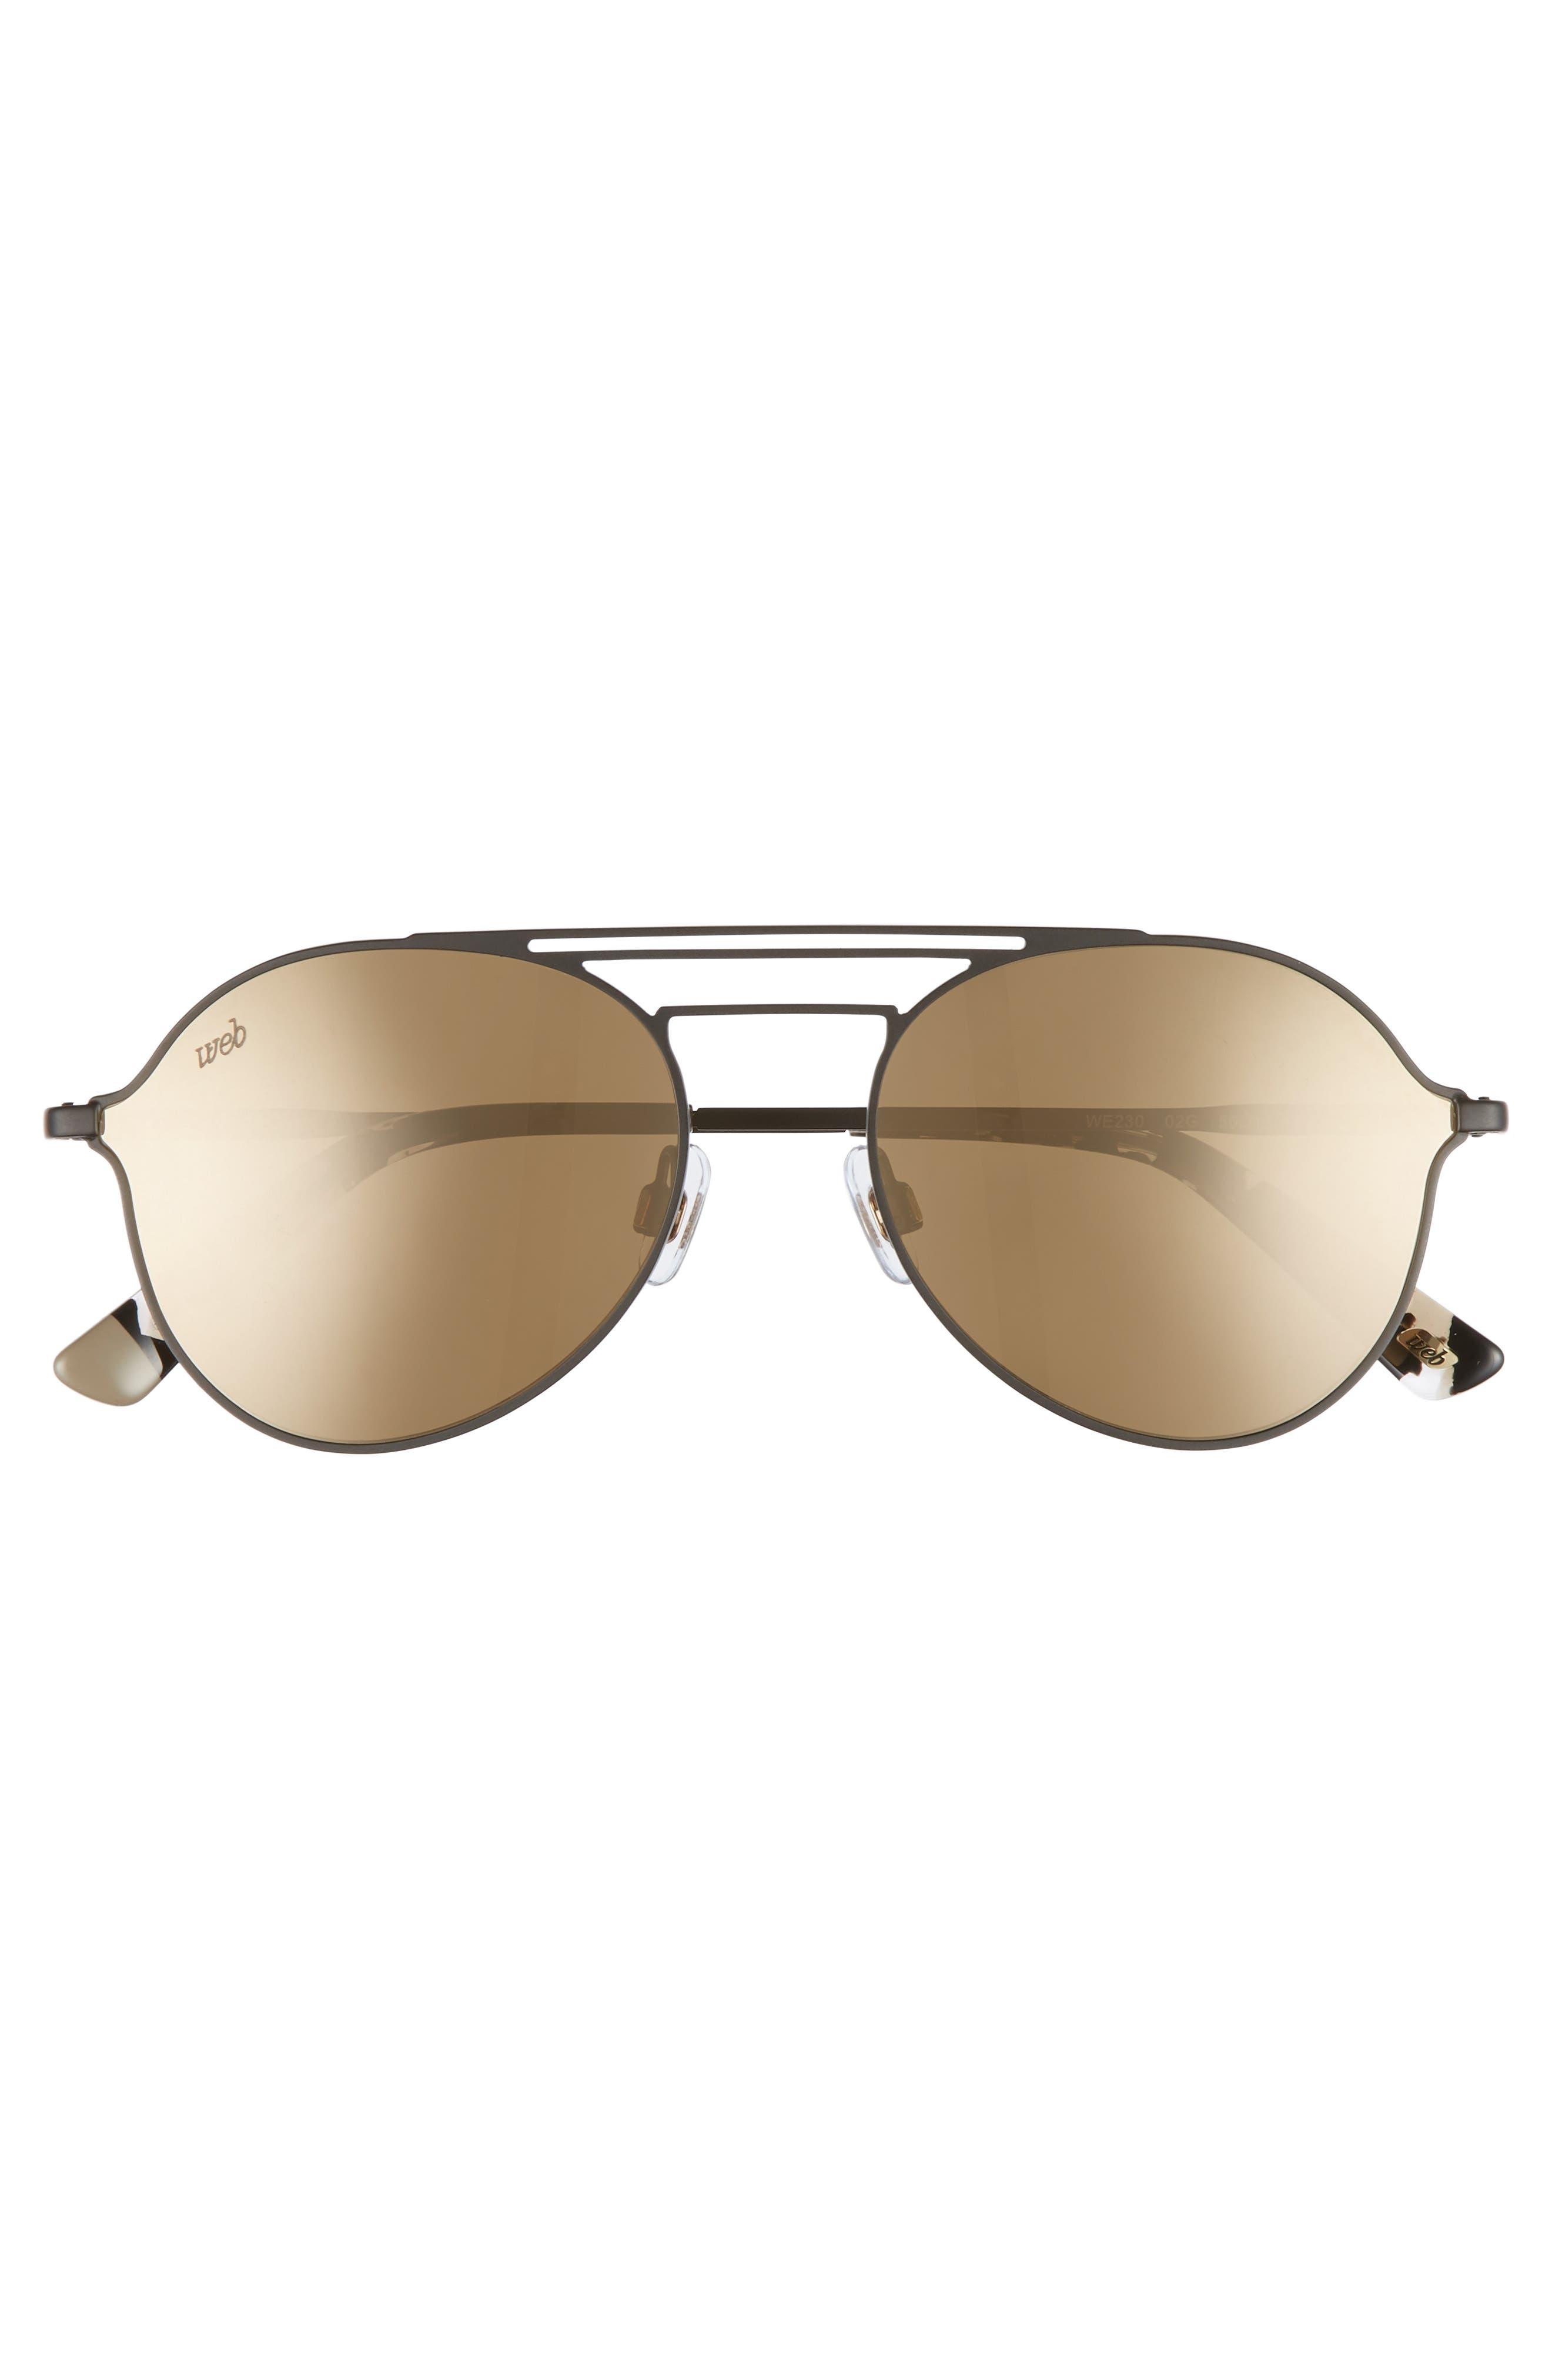 56mm Aviator Sunglasses,                             Alternate thumbnail 3, color,                             MATTE BLACK/ BROWN MIRROR